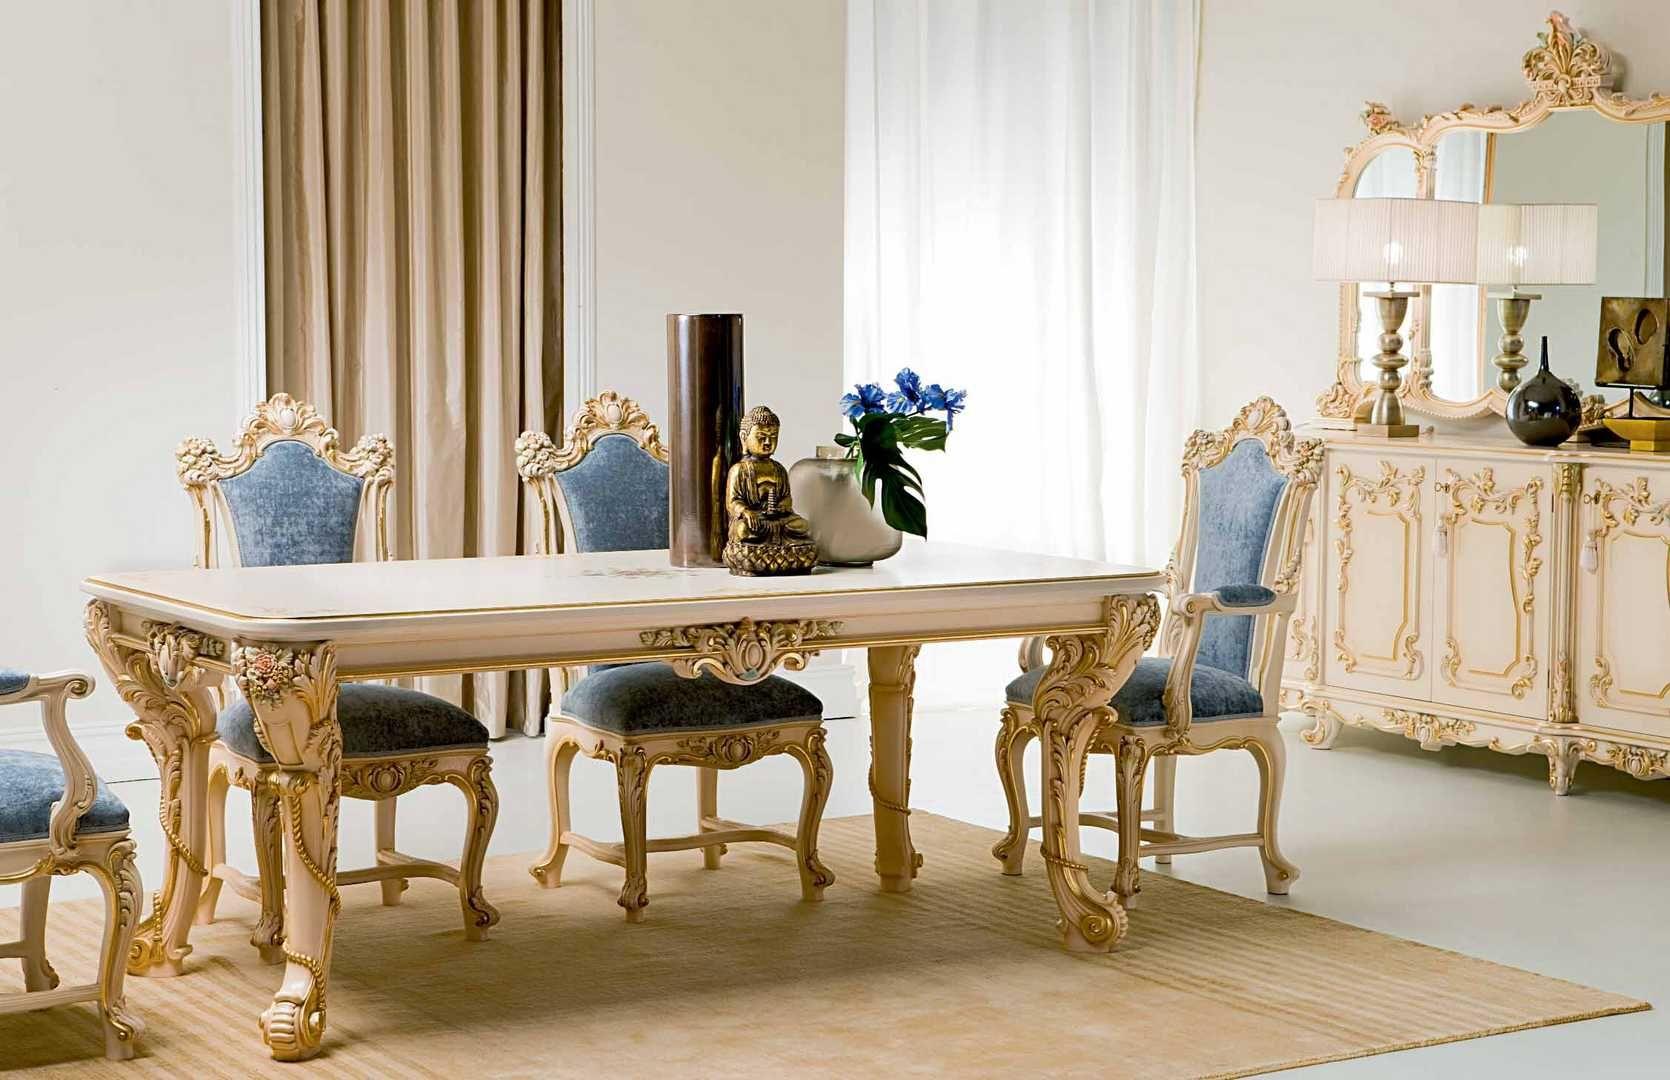 LuxuryItalianFurniture  Home Italian furnitures